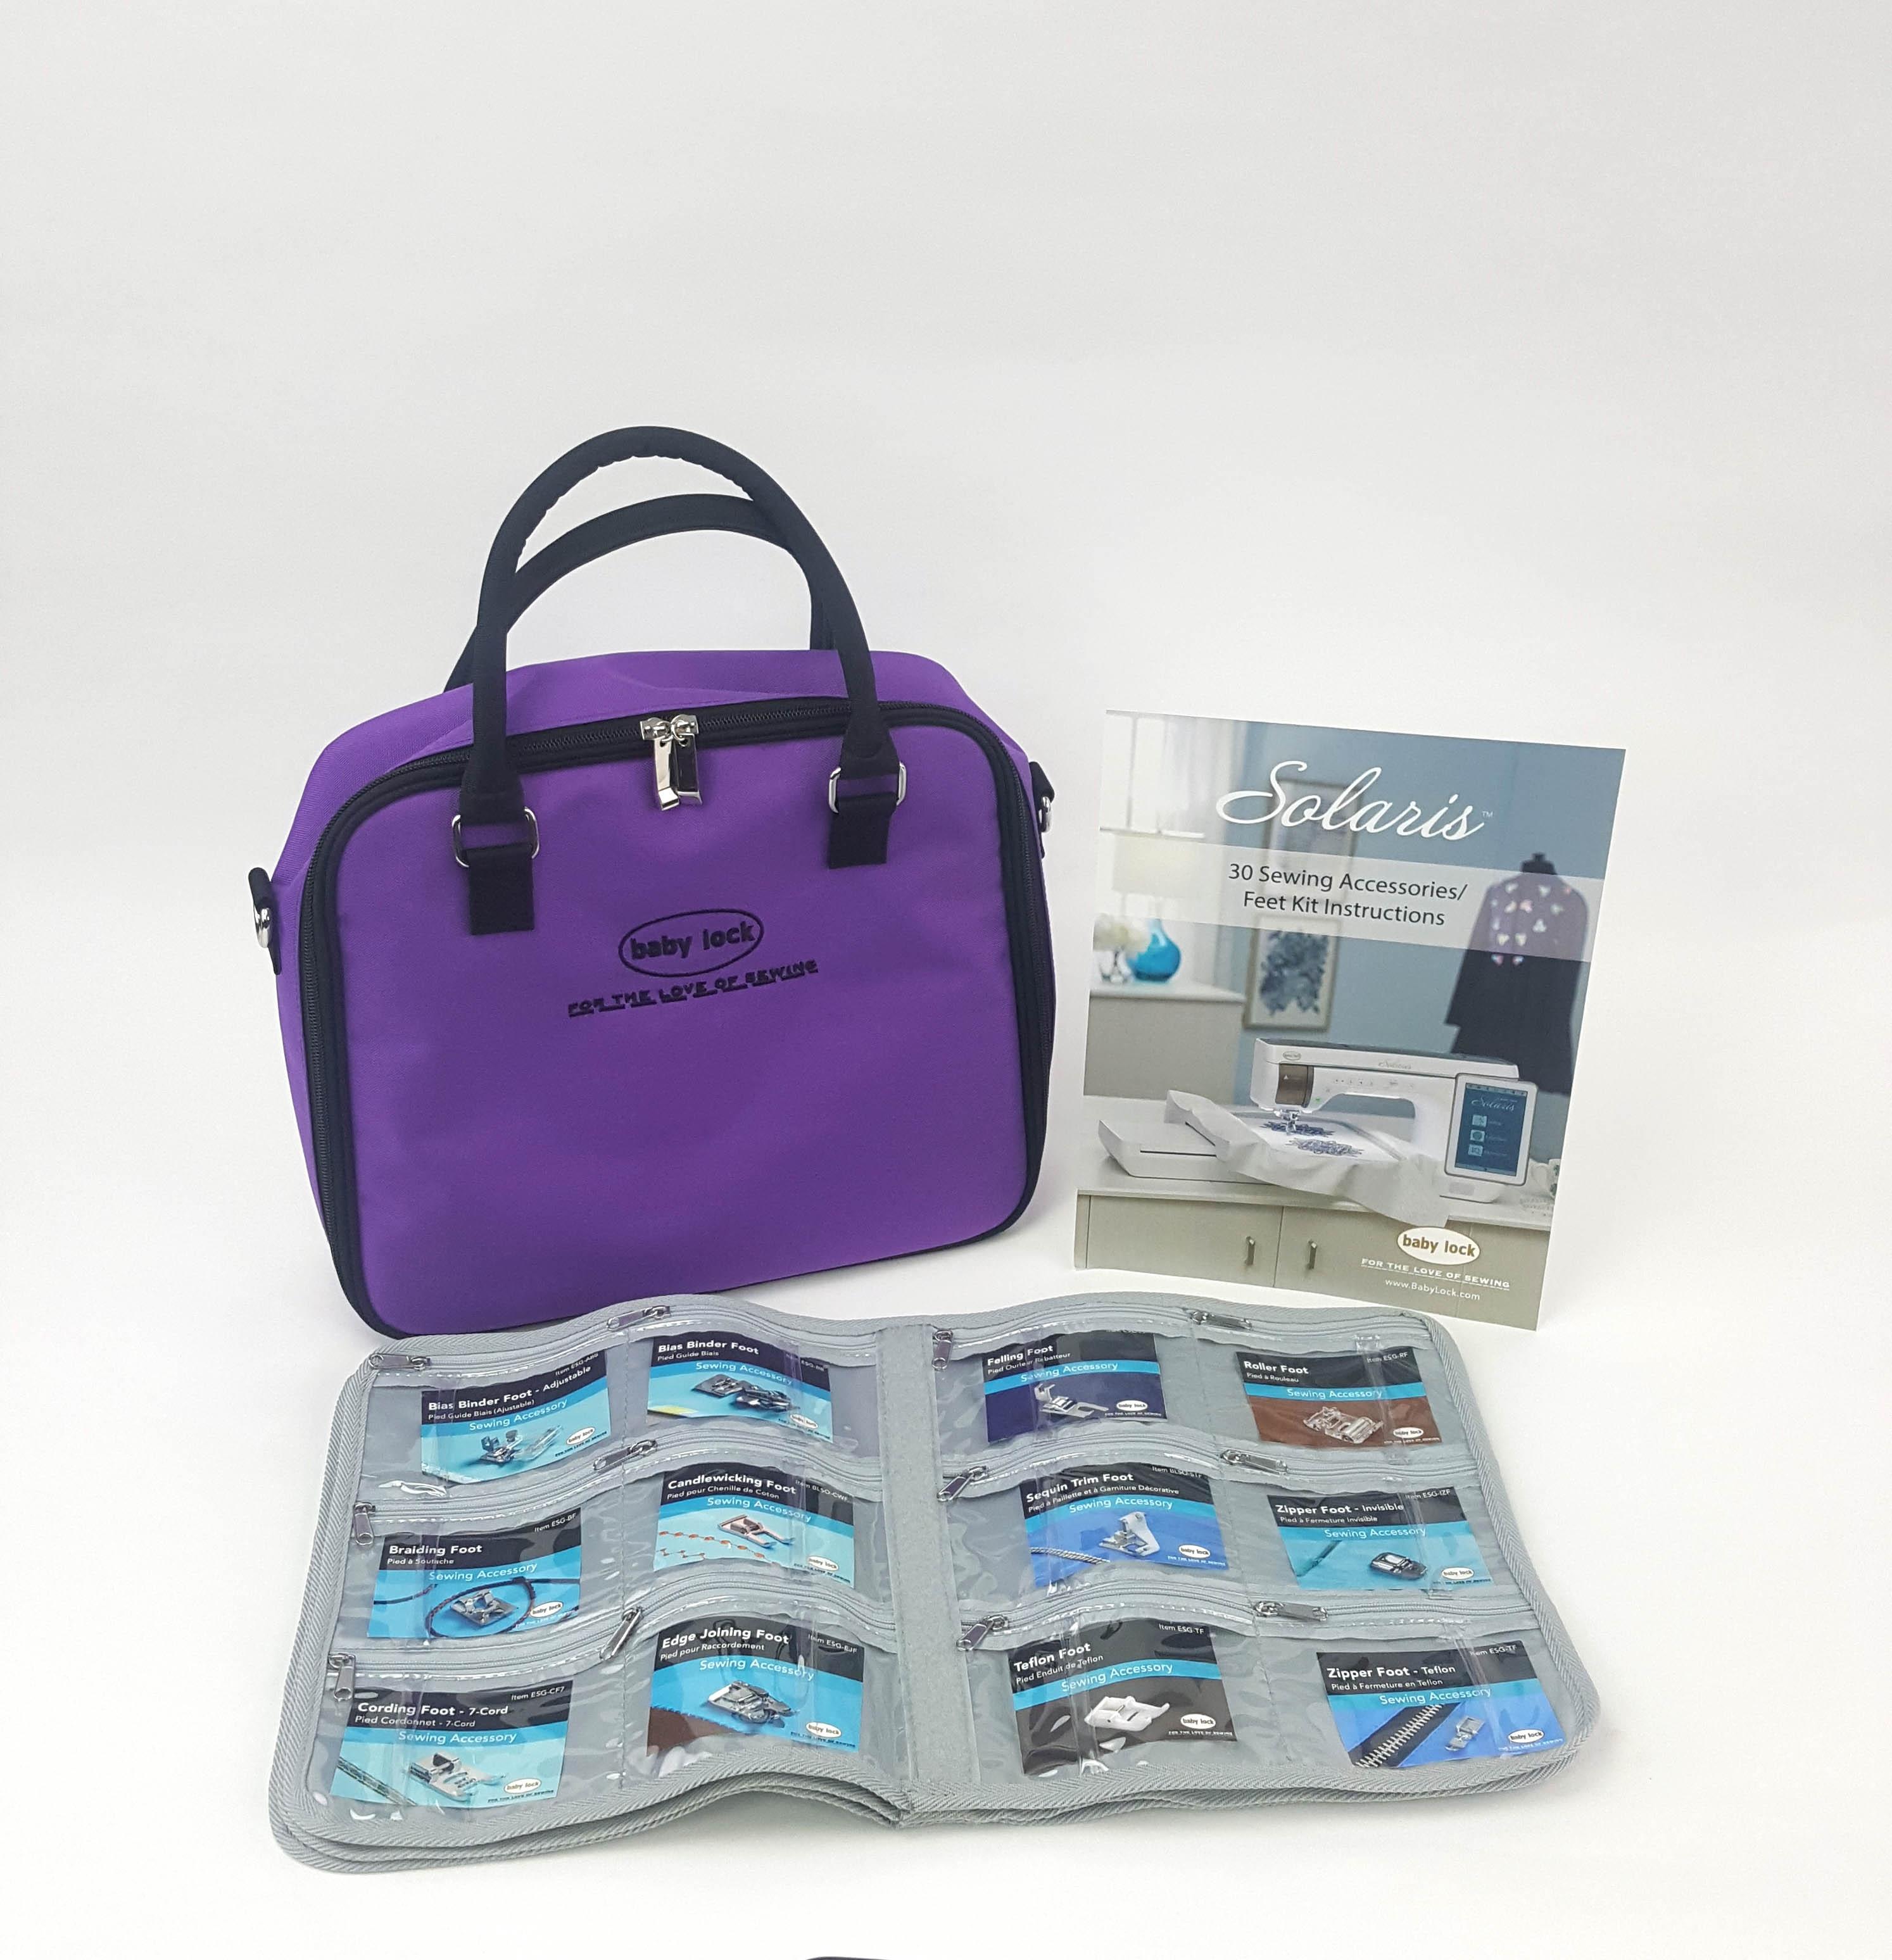 Baby Lock Solaris Foot Kit 30